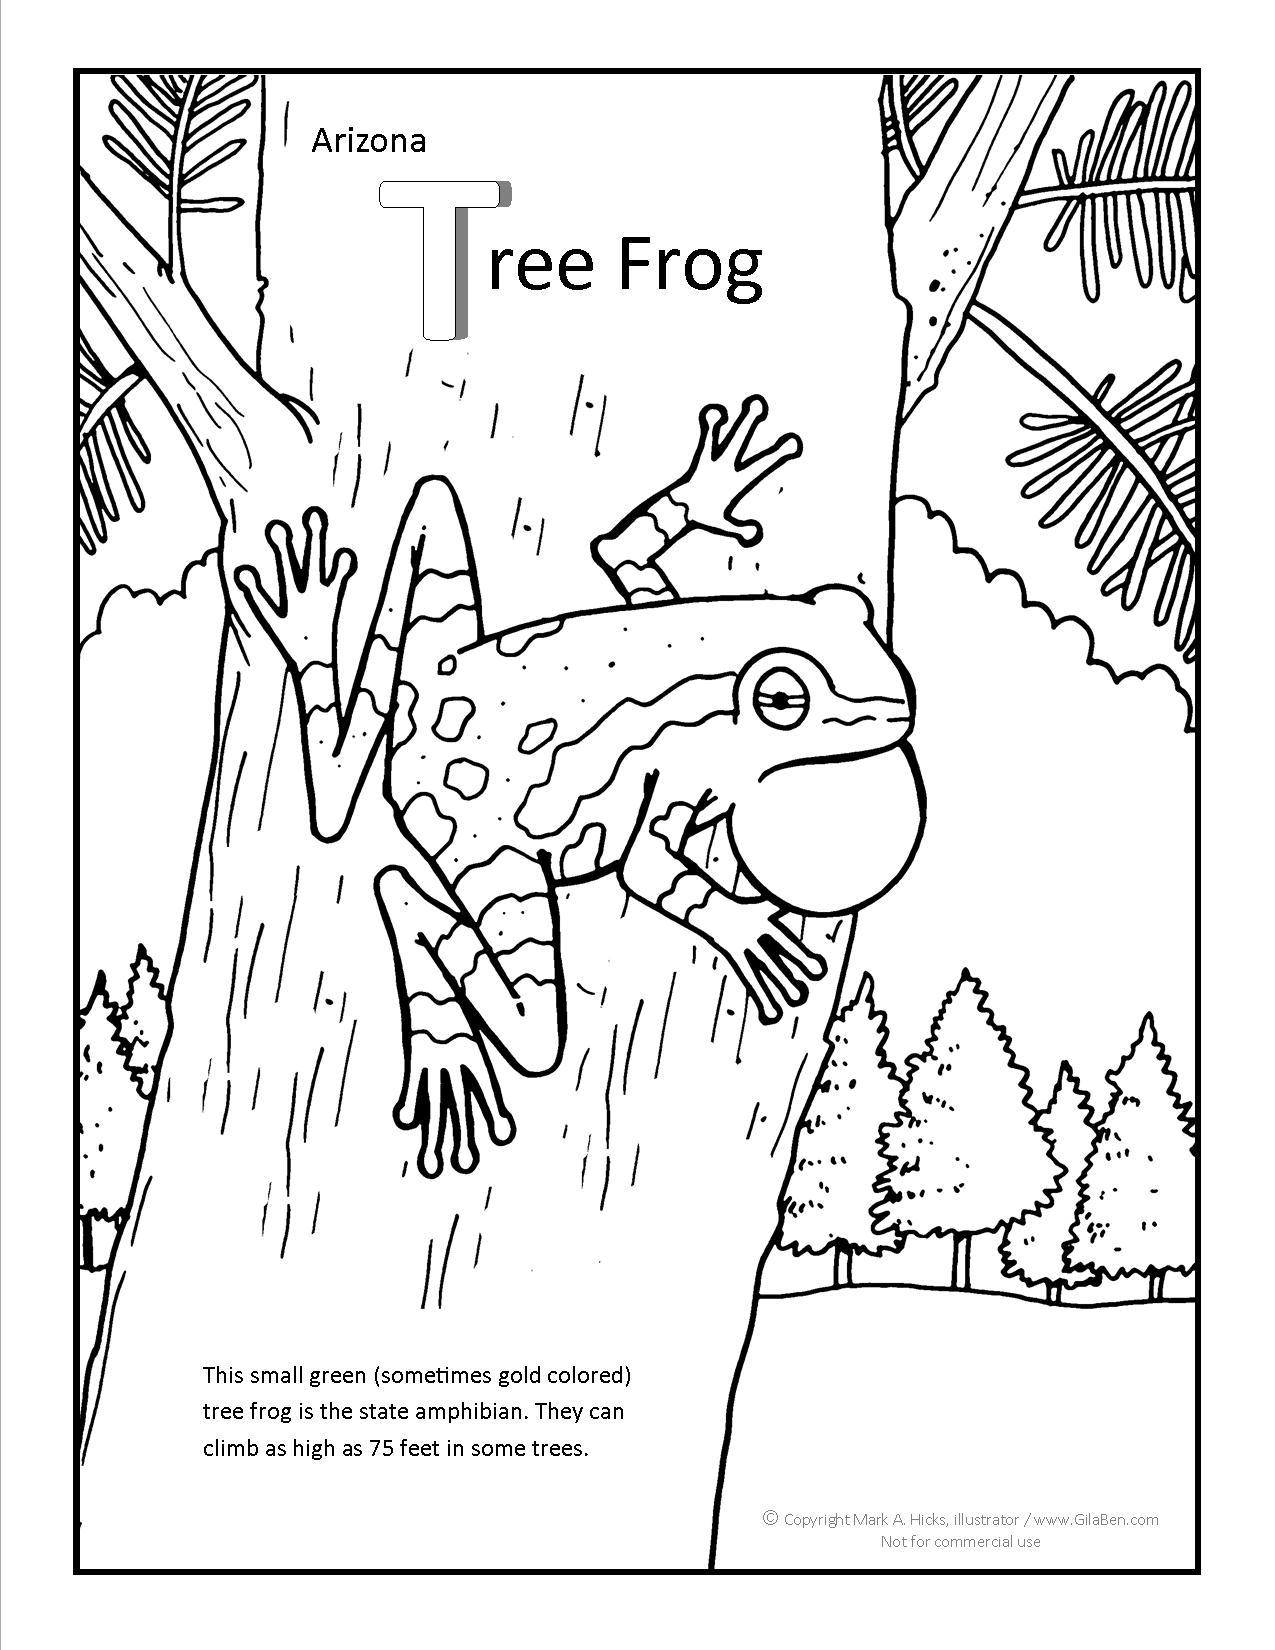 Arizona Tree Frog Coloring Page